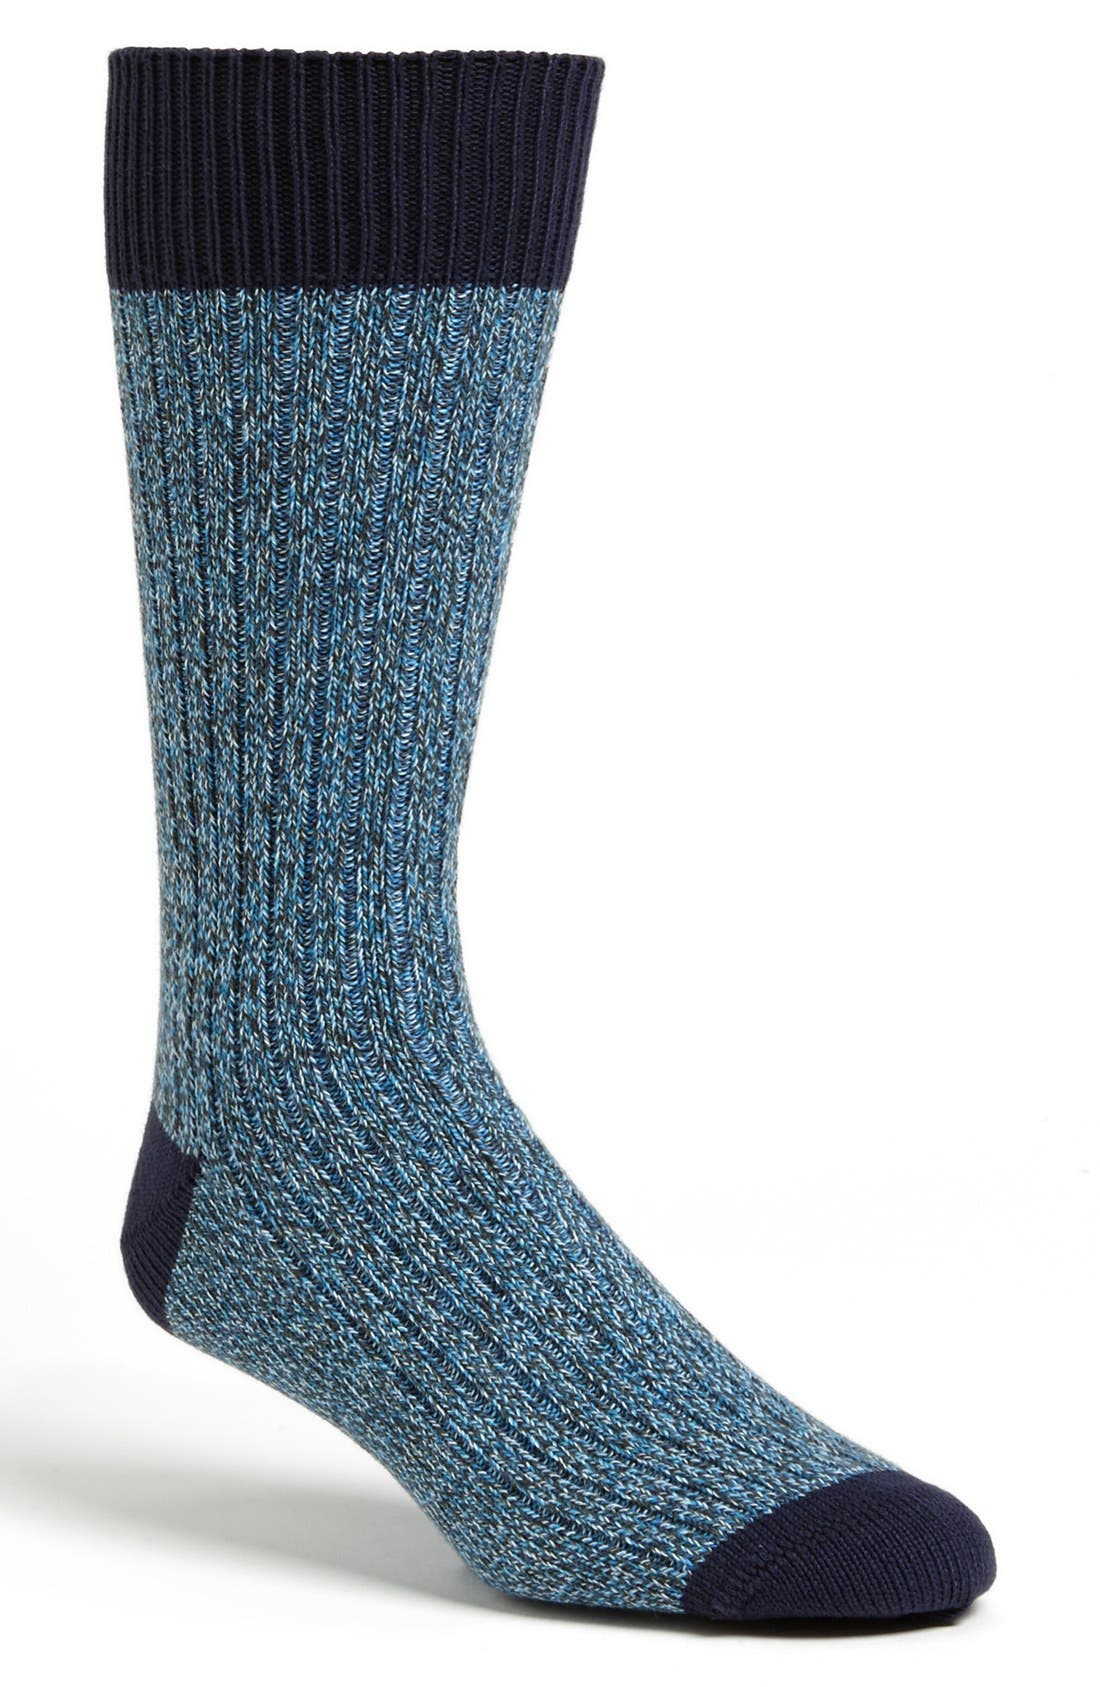 Main Image - Paul Smith Cotton Blend Socks